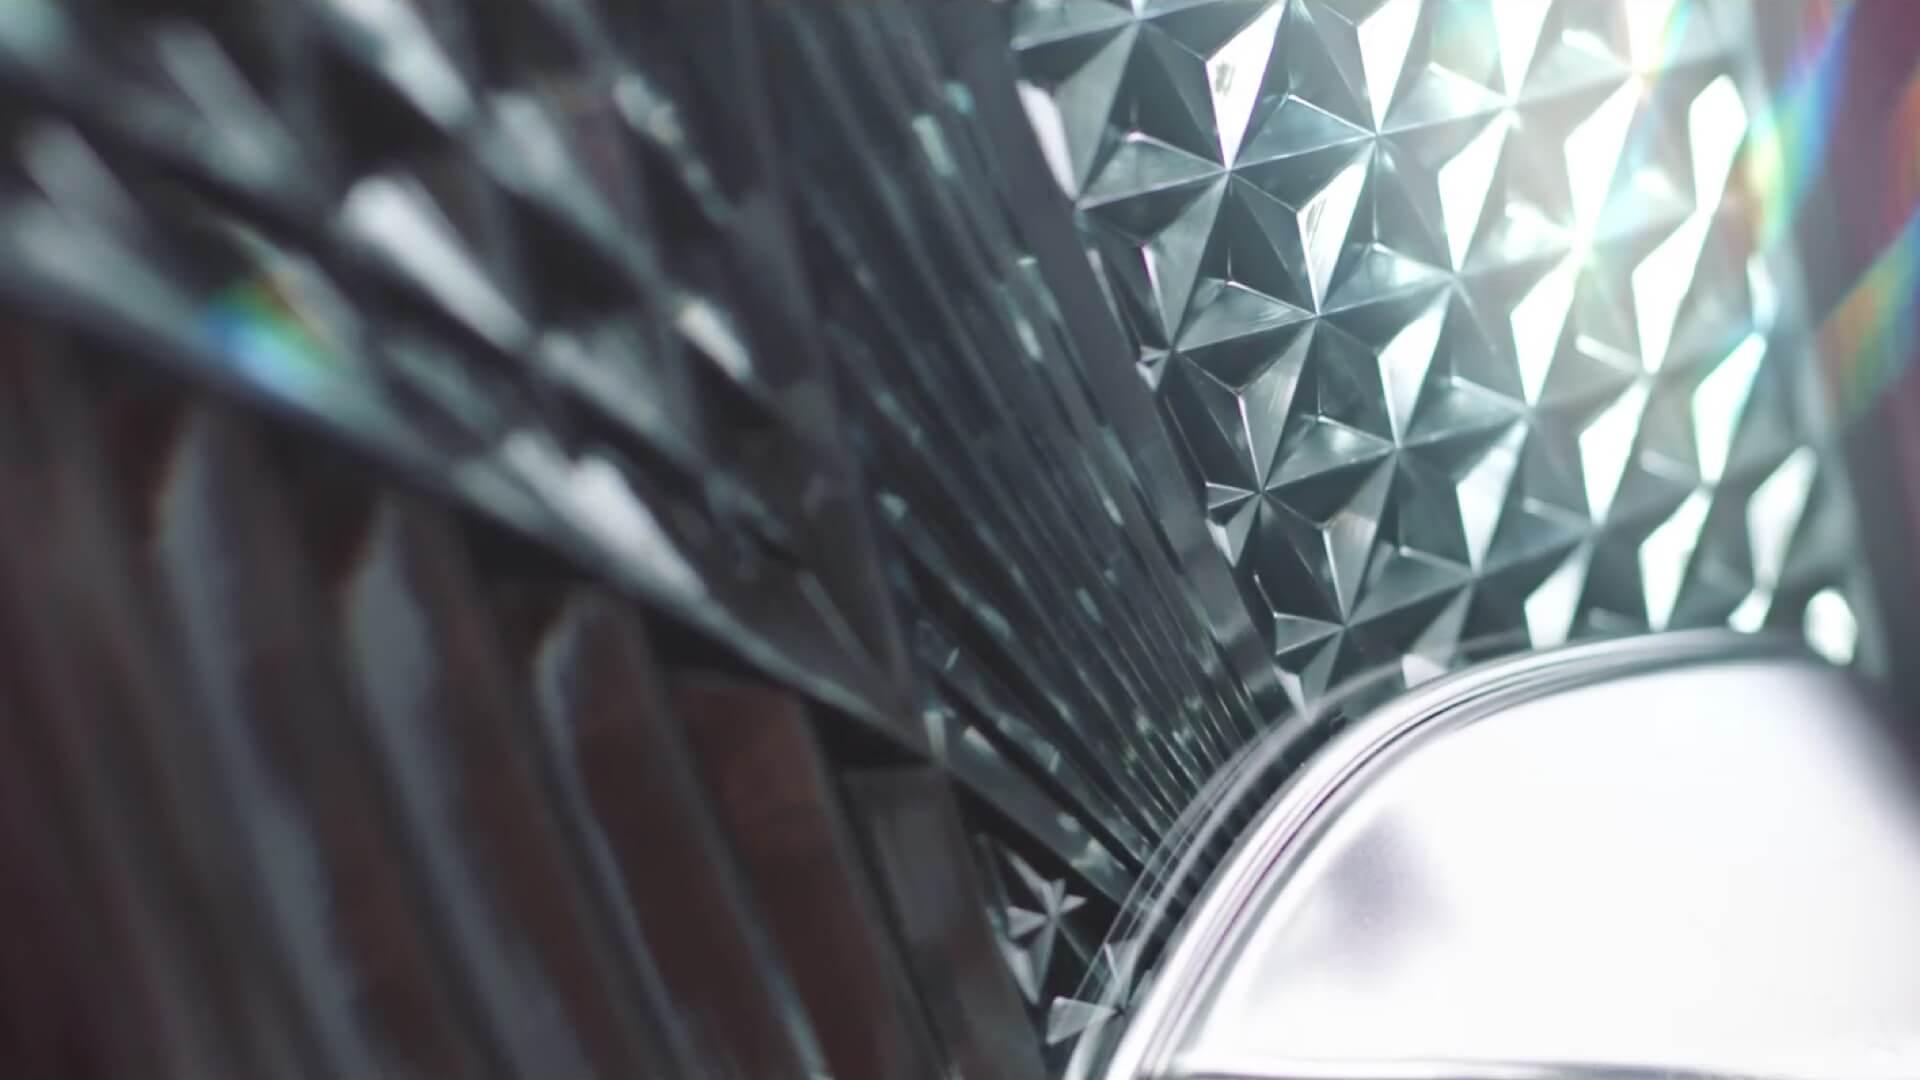 takumi flagship craft kiriko glass